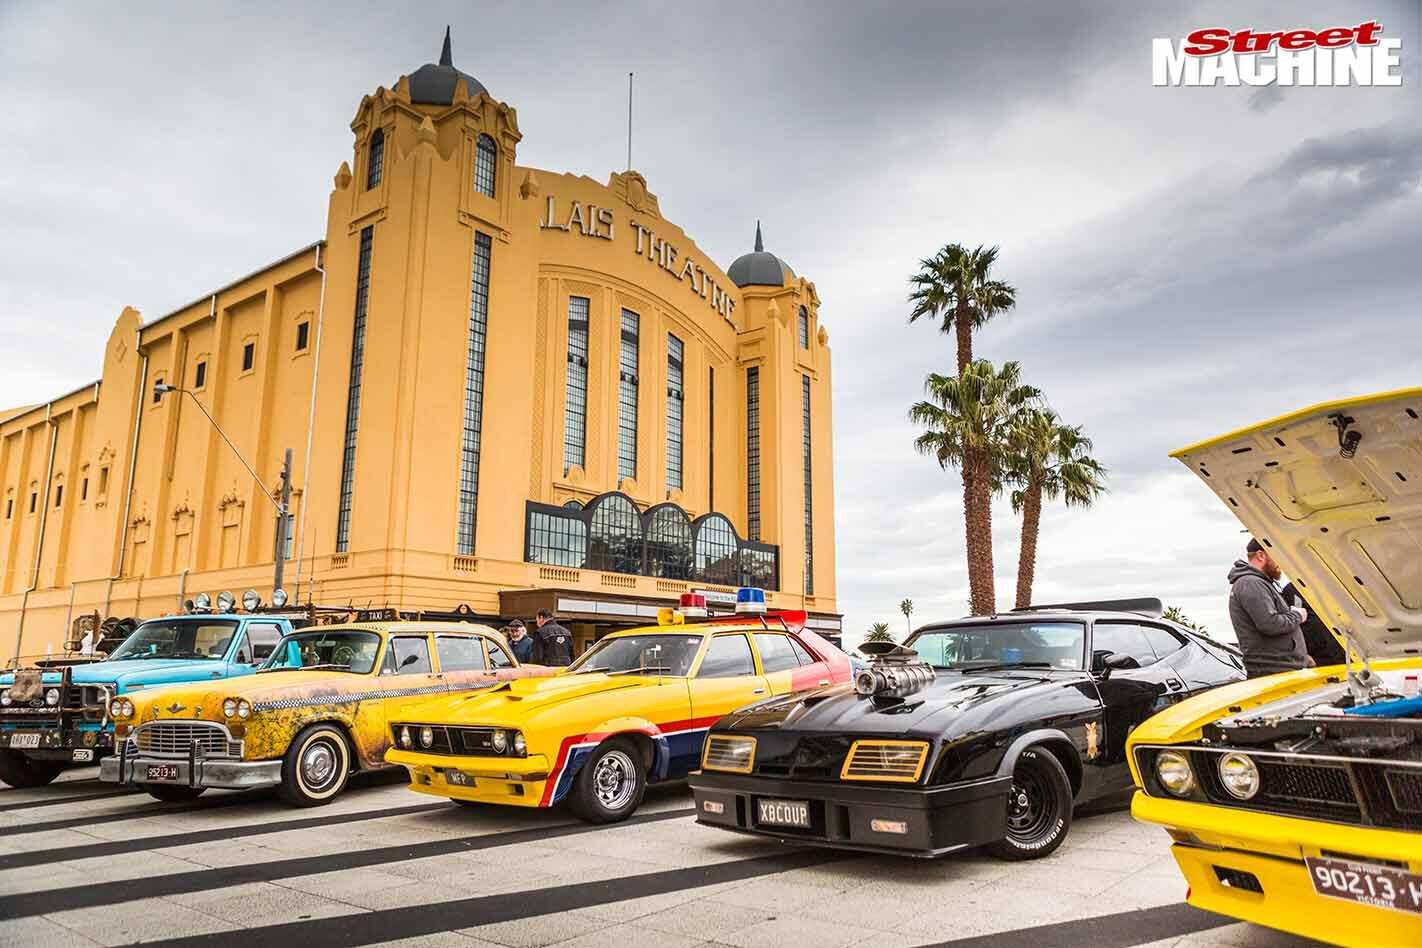 St Kilda car show